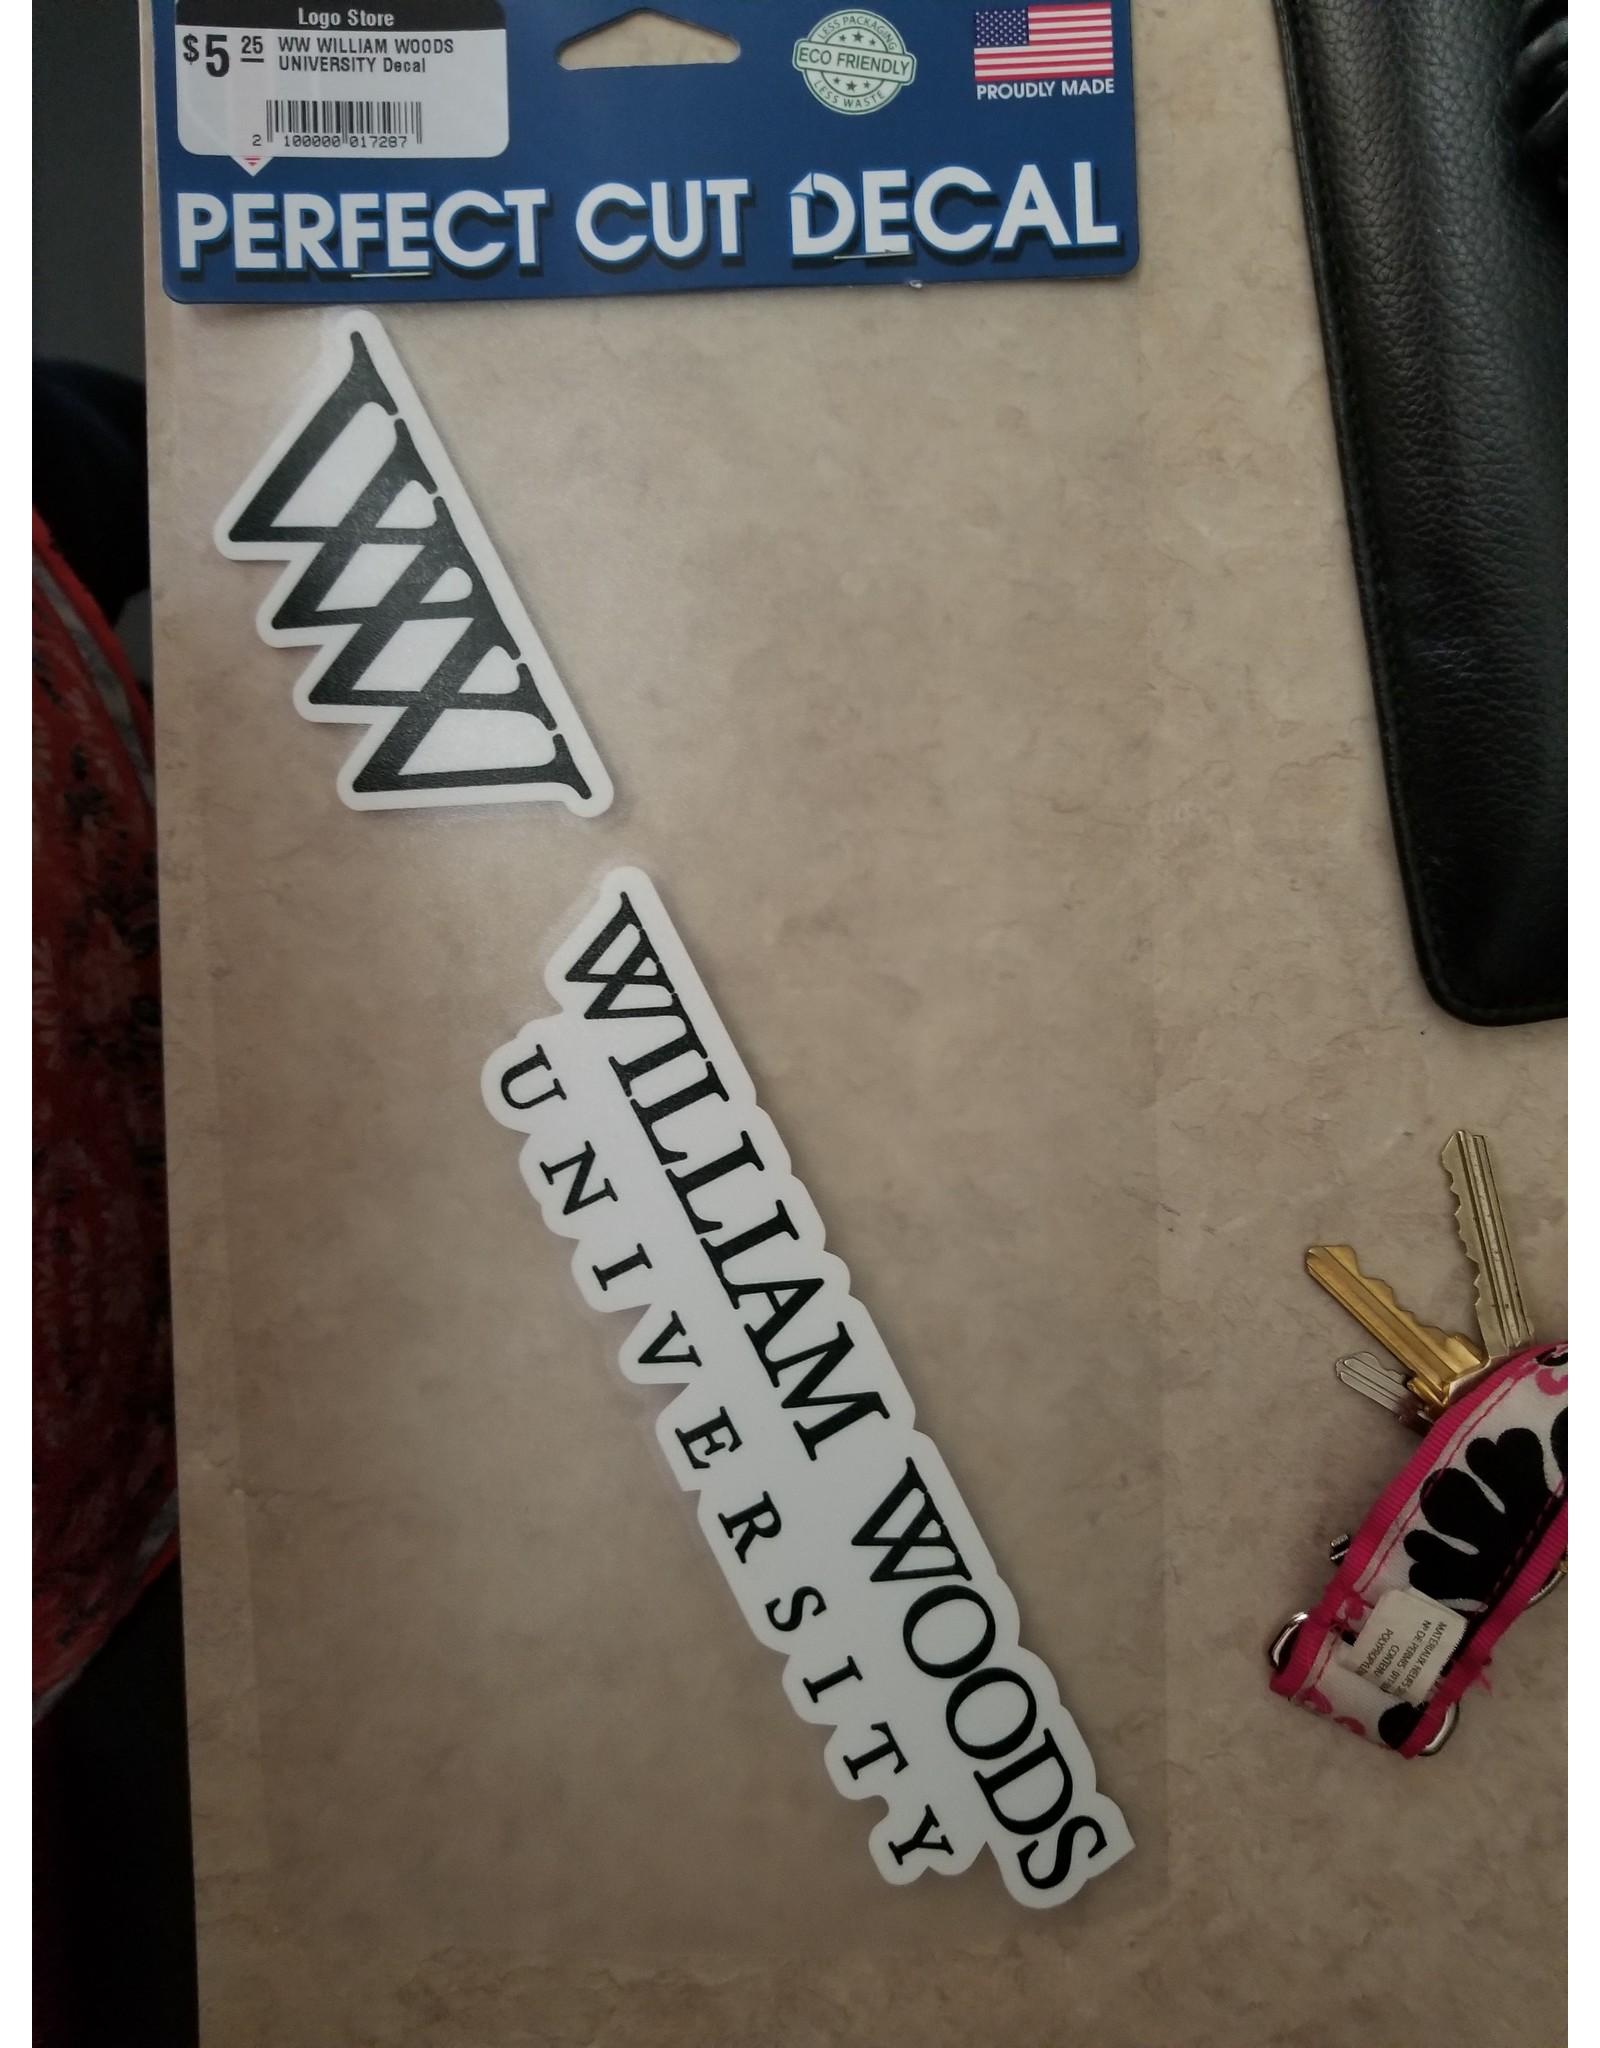 WW William Woods University Decal